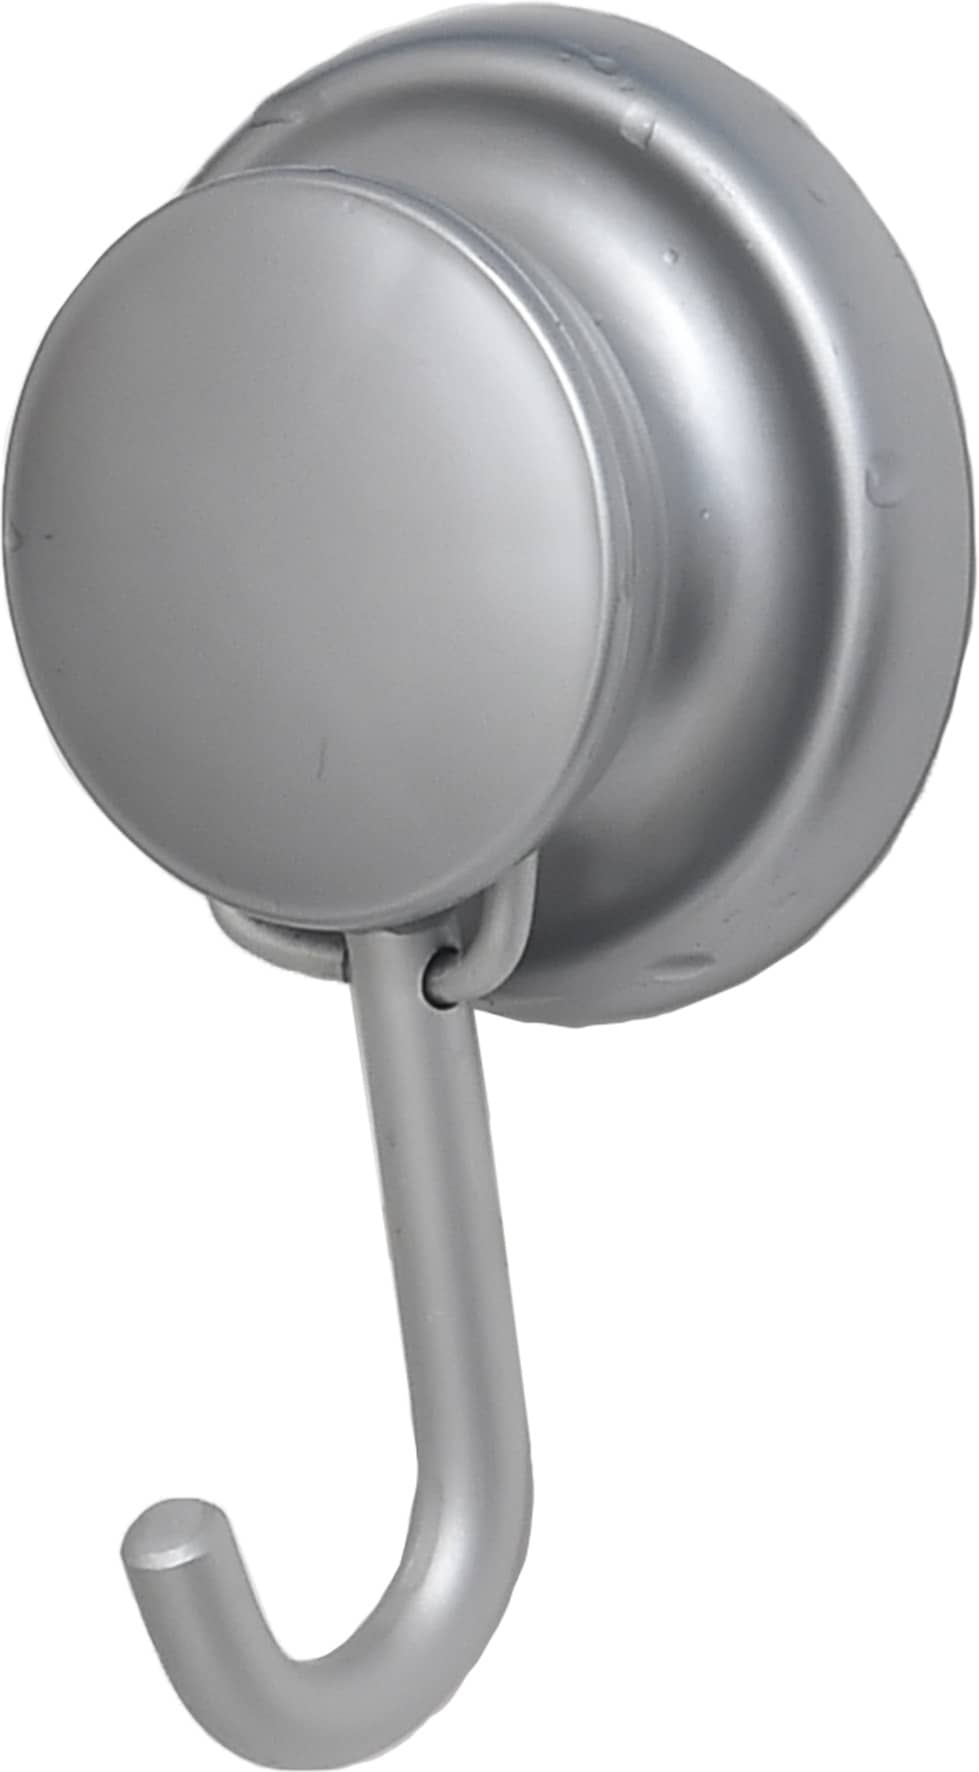 4goodz Aluminium Handdoekhaak met vacuum Zuignap